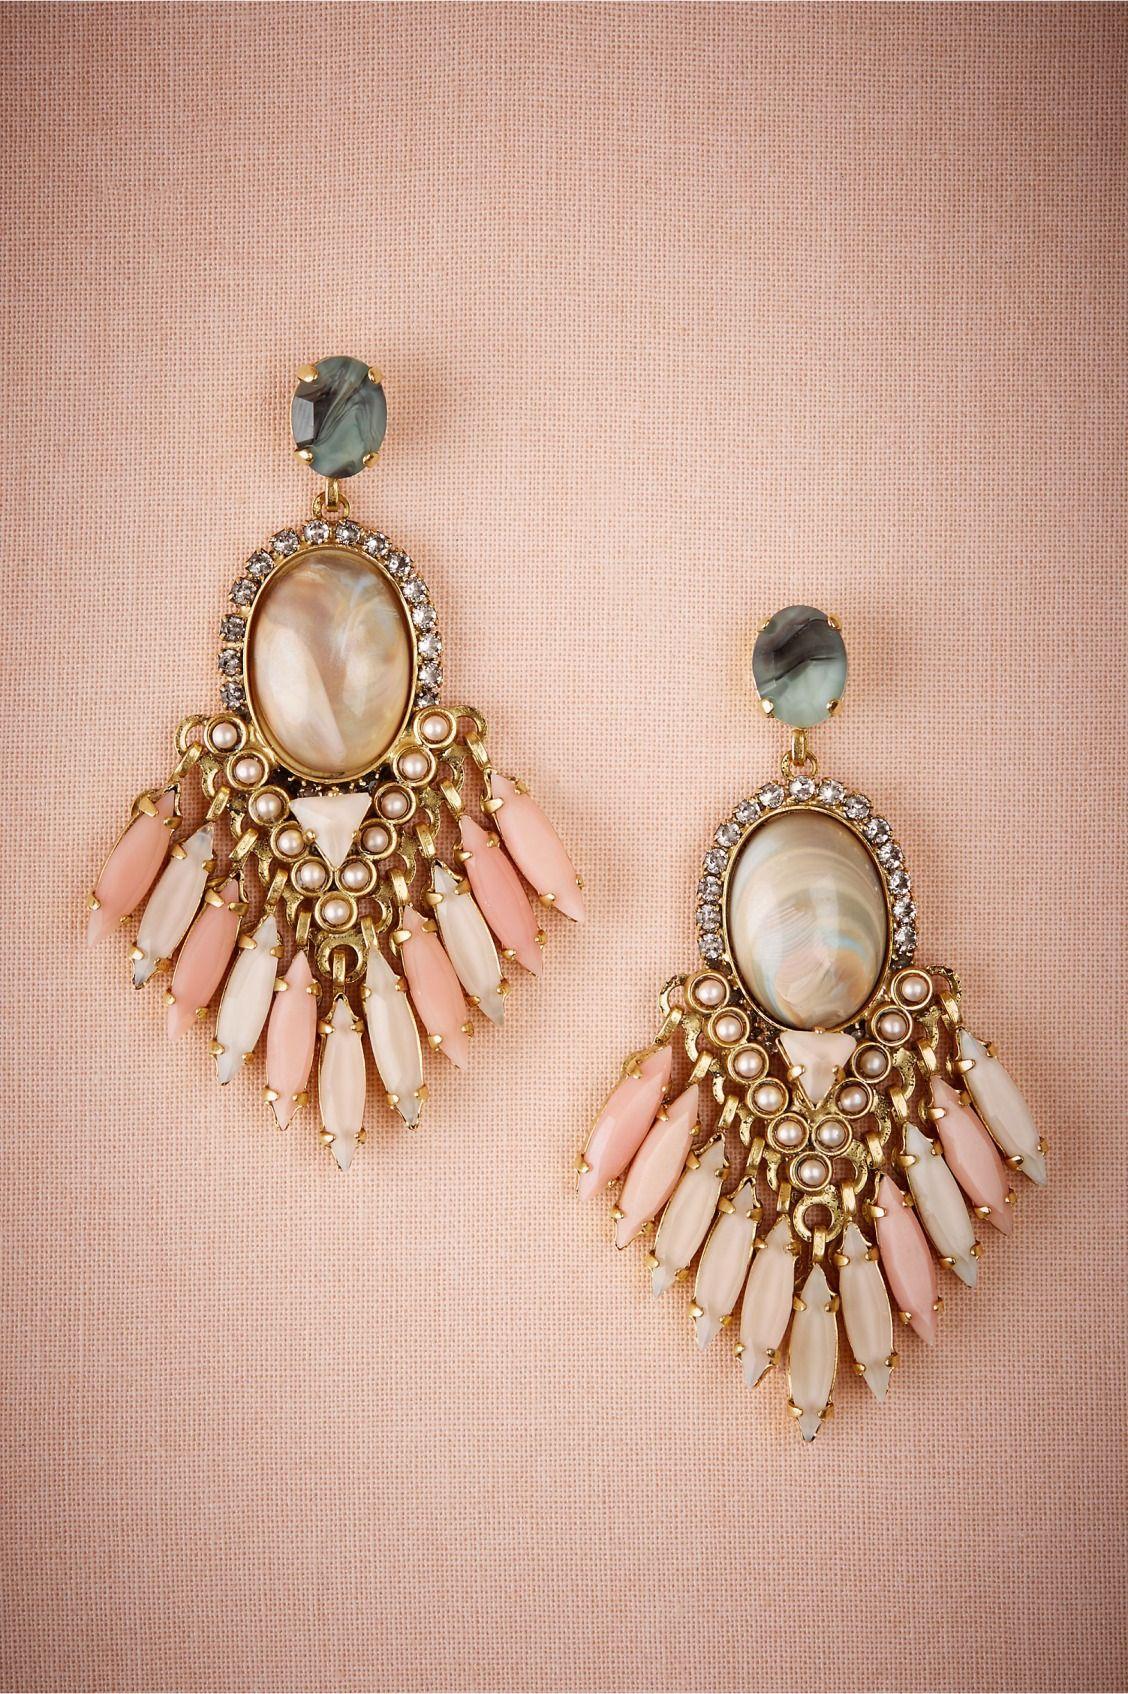 Tunia Earrings Bride earrings, Bridal jewelry, Fashion